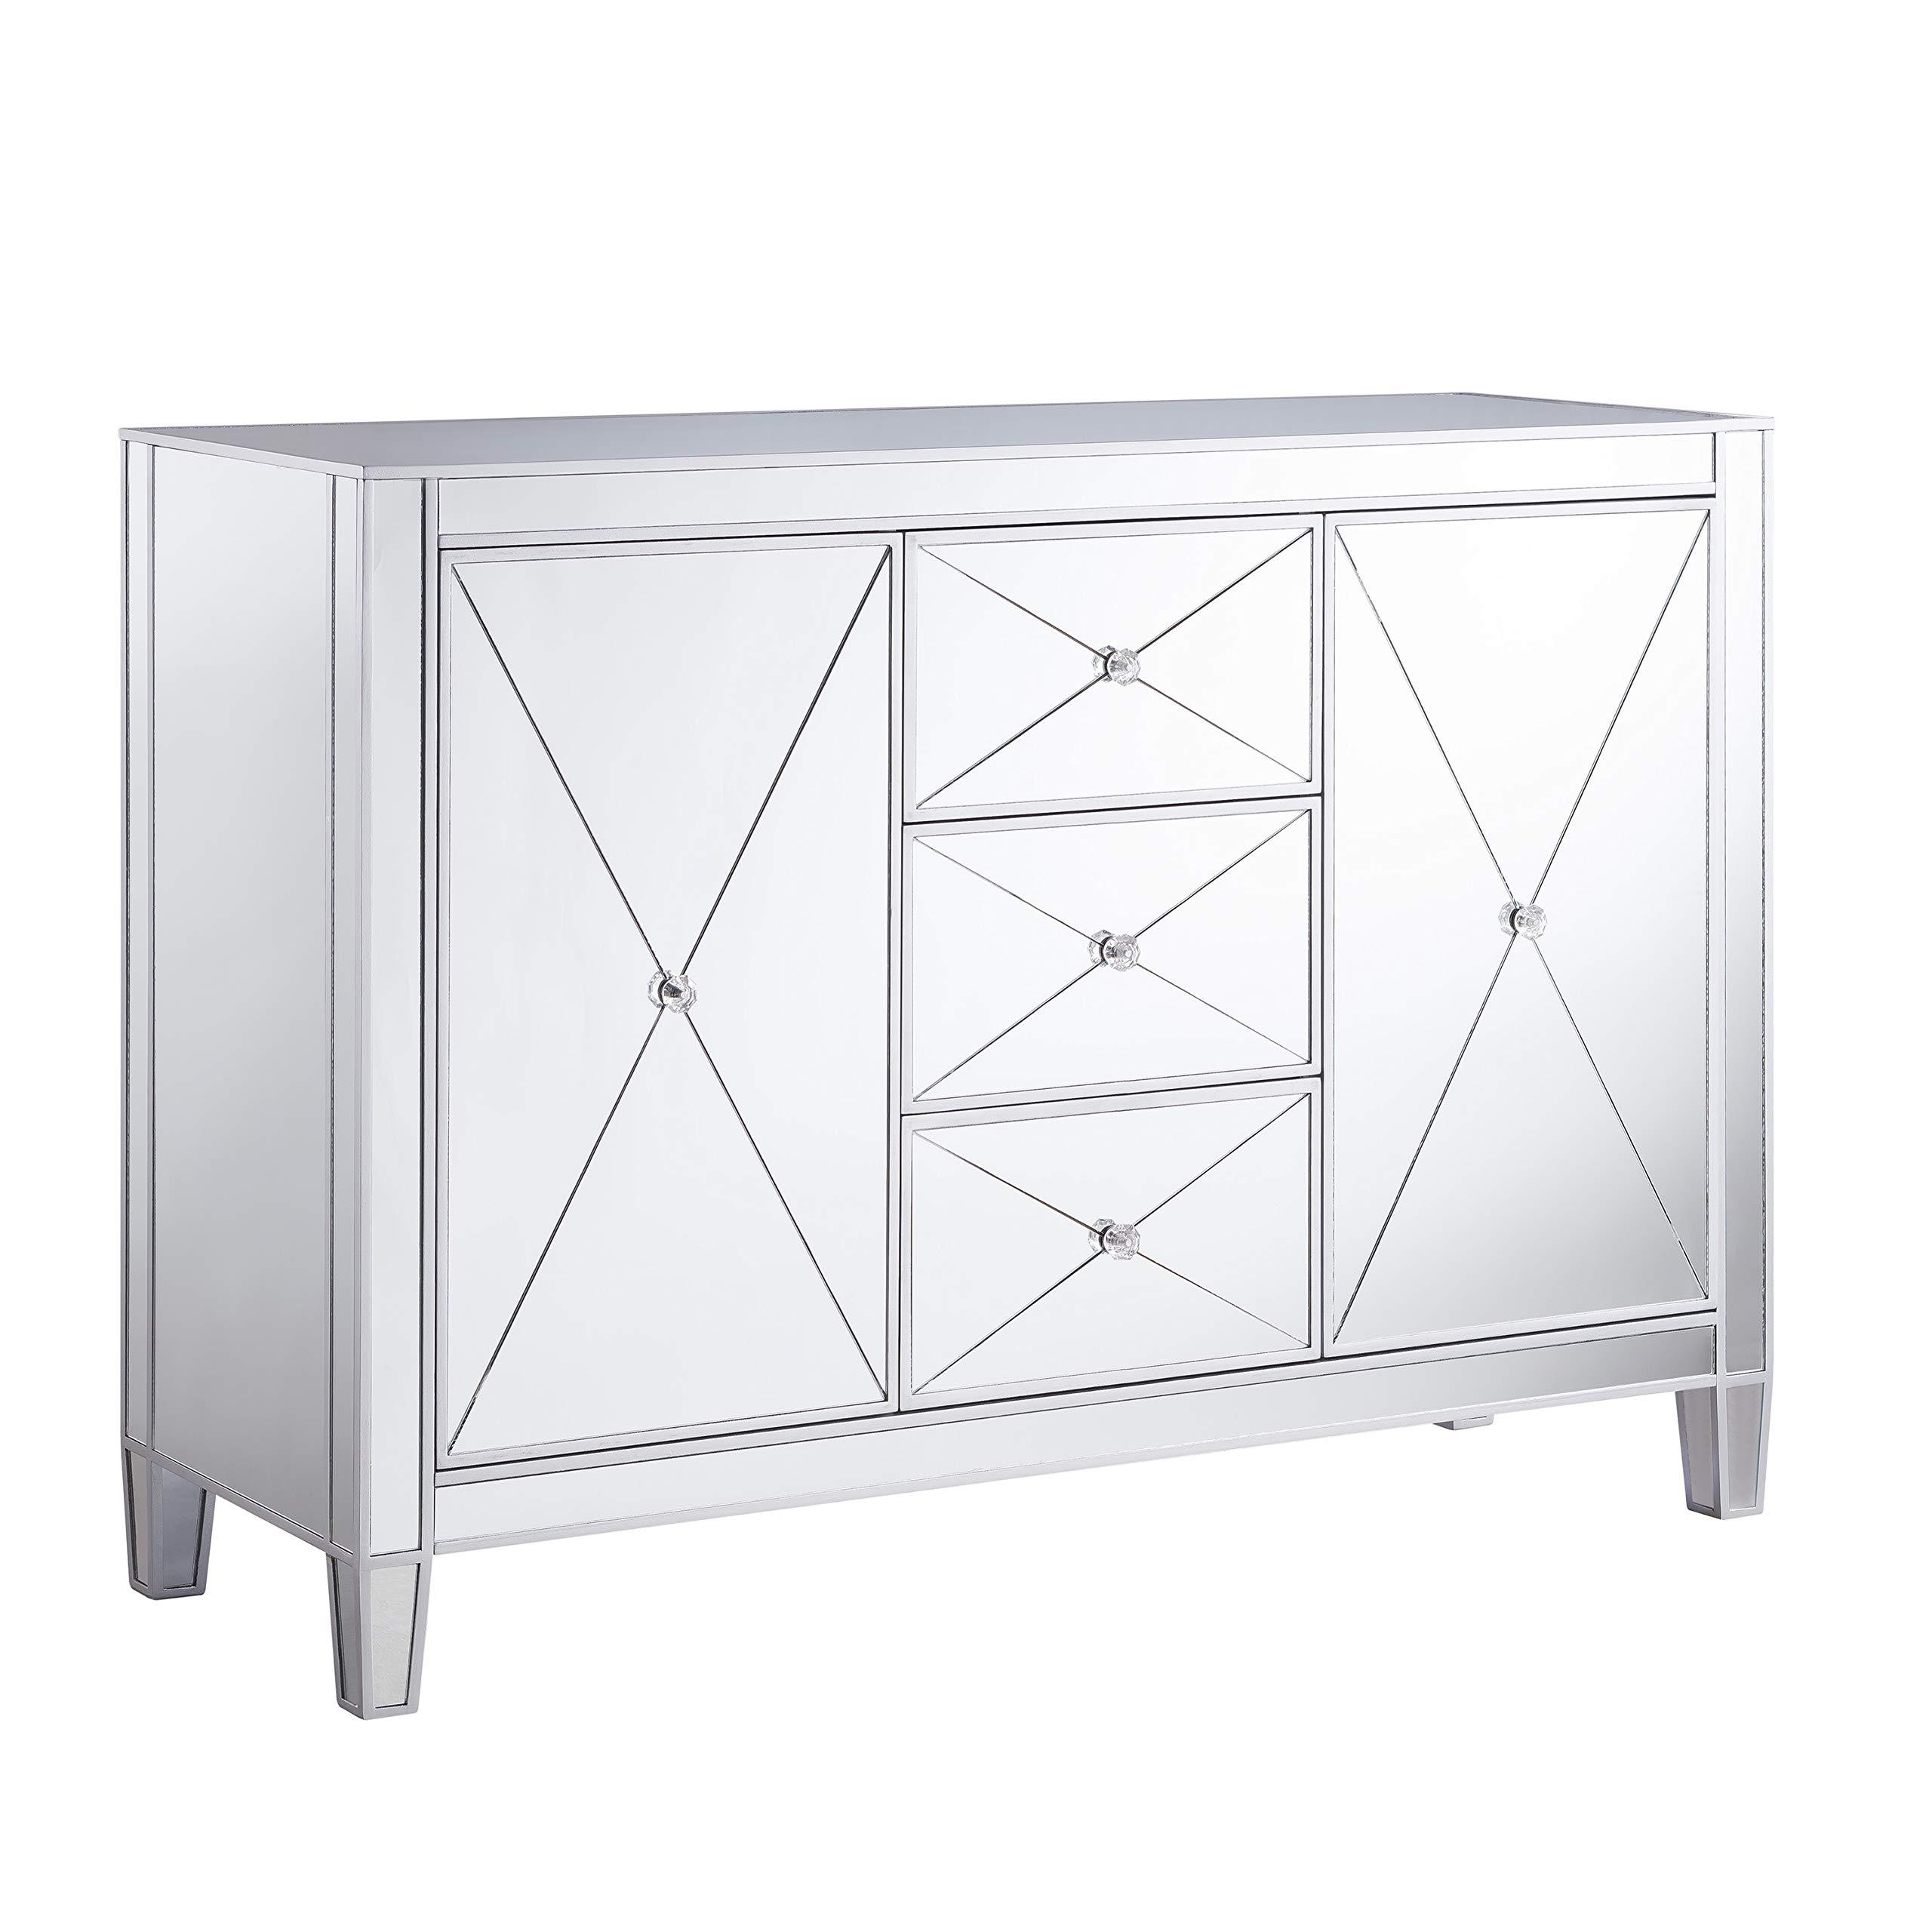 Southern Enterprises Mirage Cabinet, 16 X 32.25, Mirrored with matte silver trim by Southern Enterprises